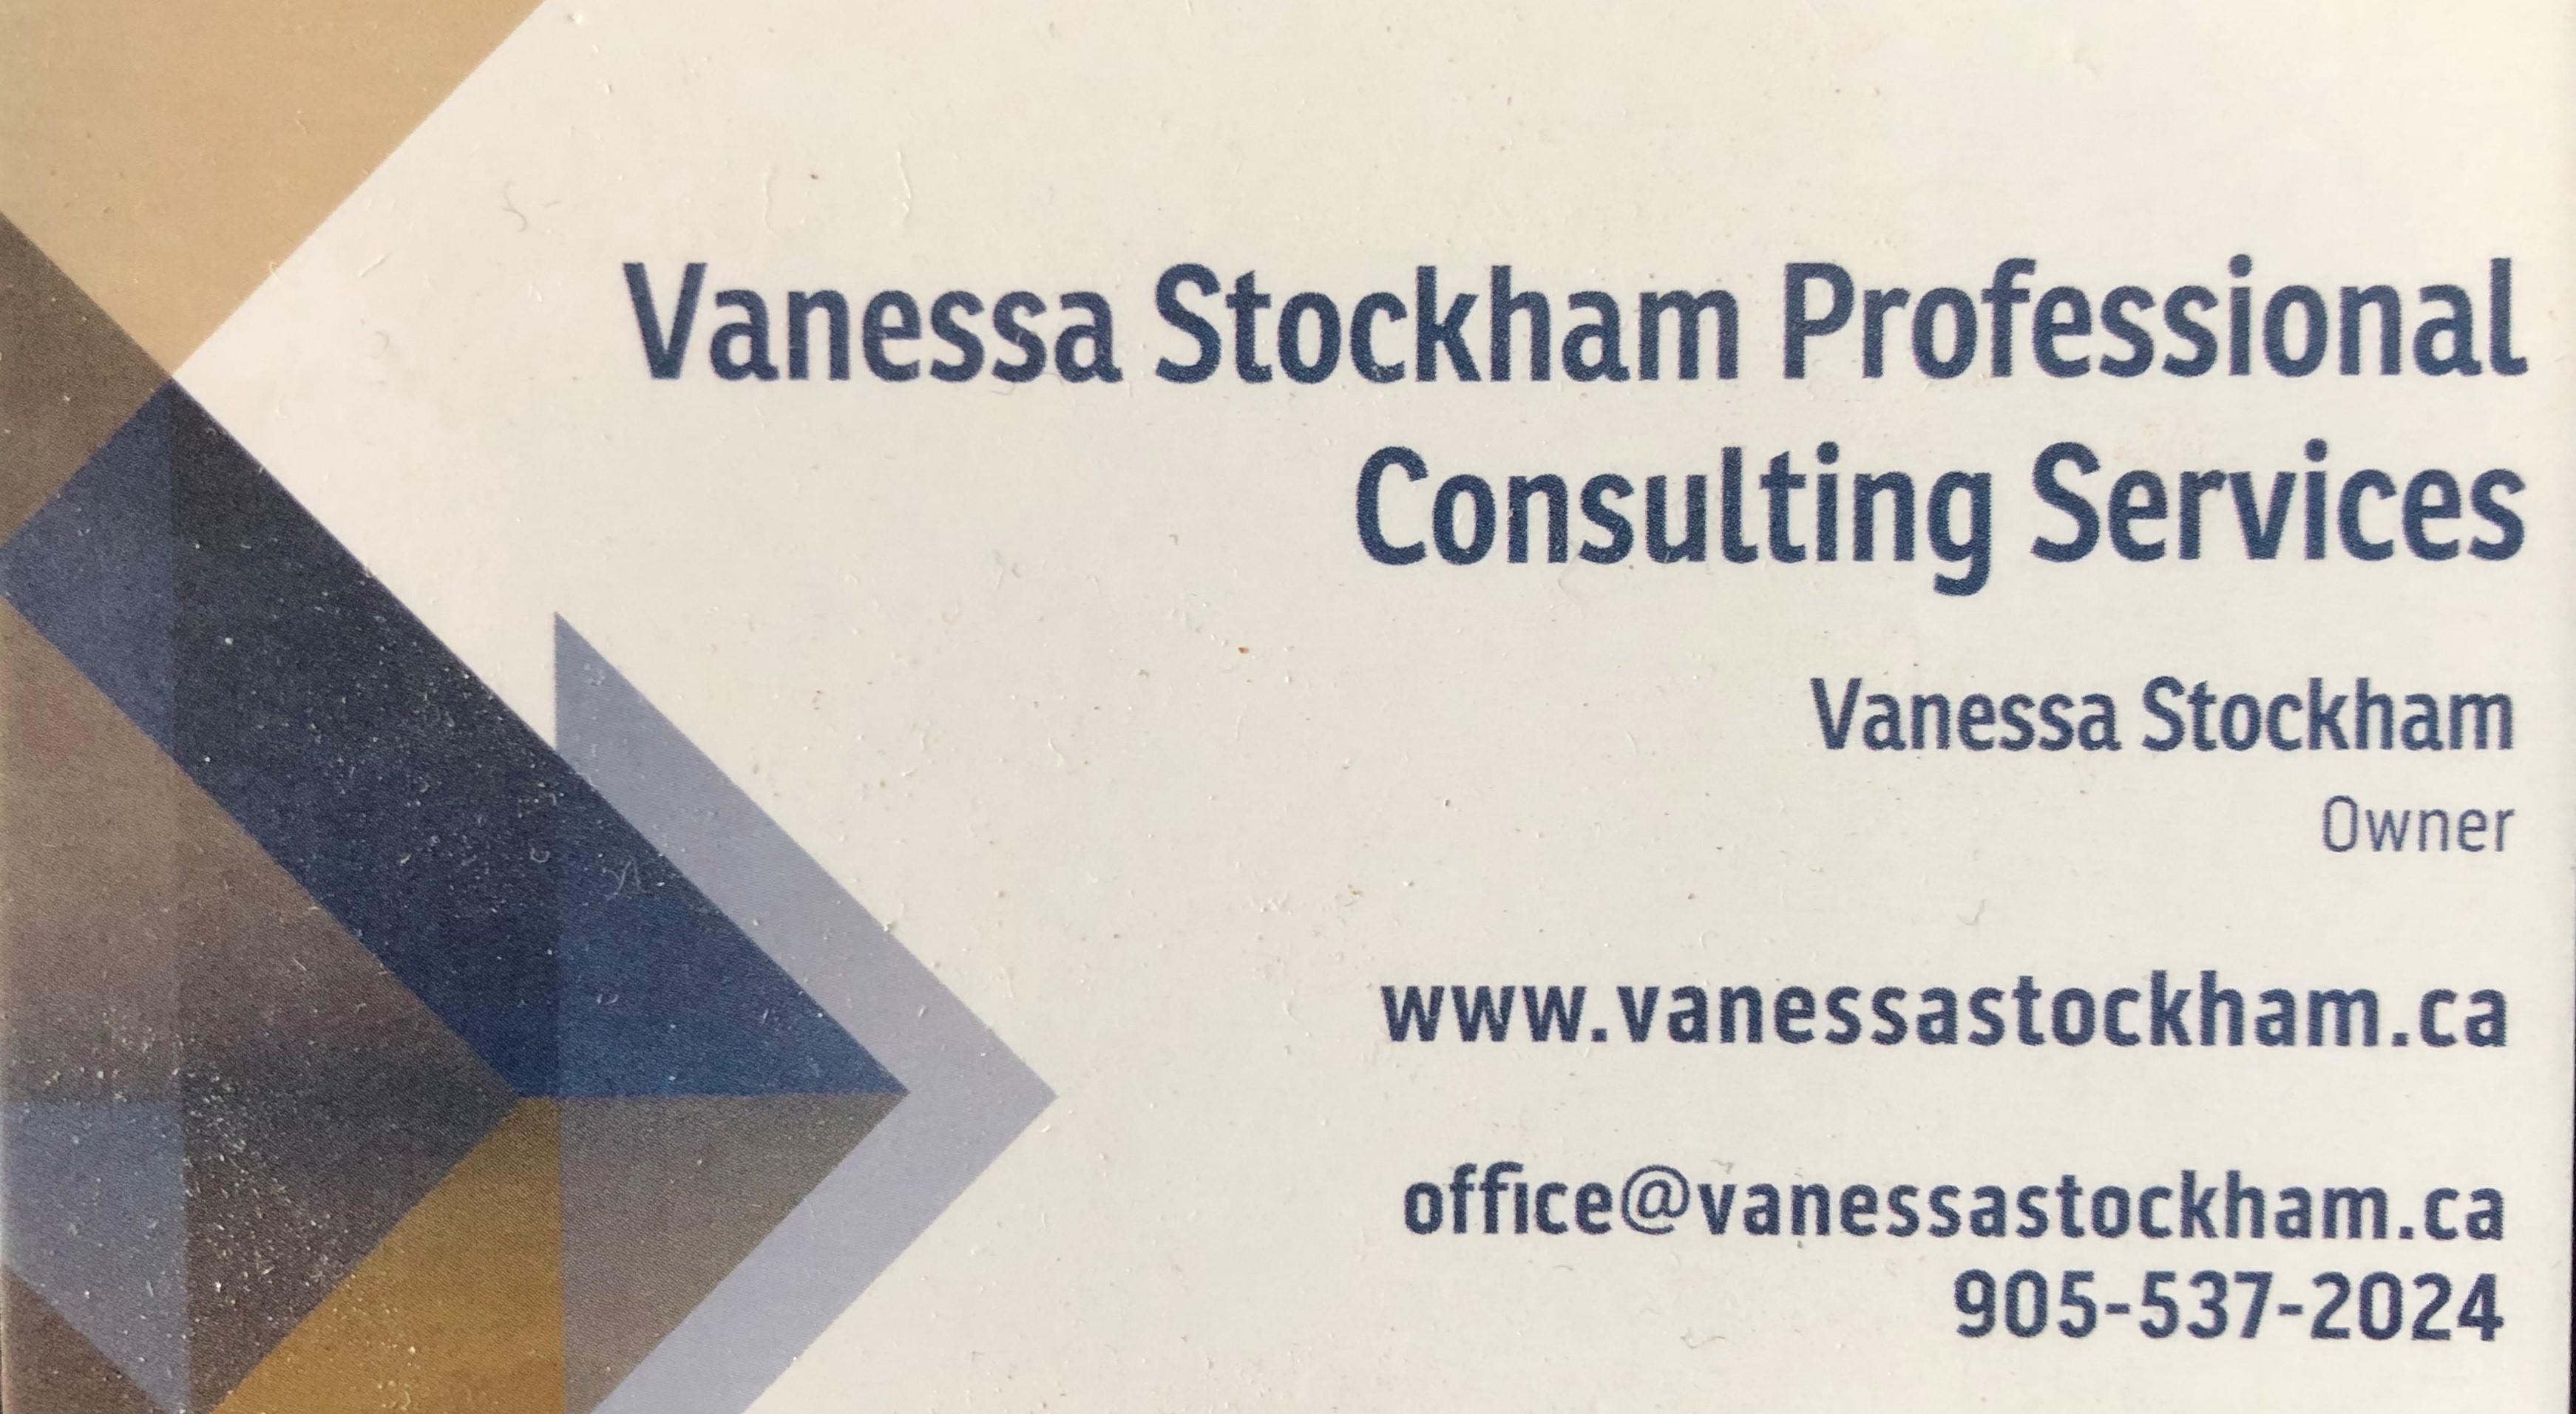 Vanessa Stockahm Professional Consulting Services